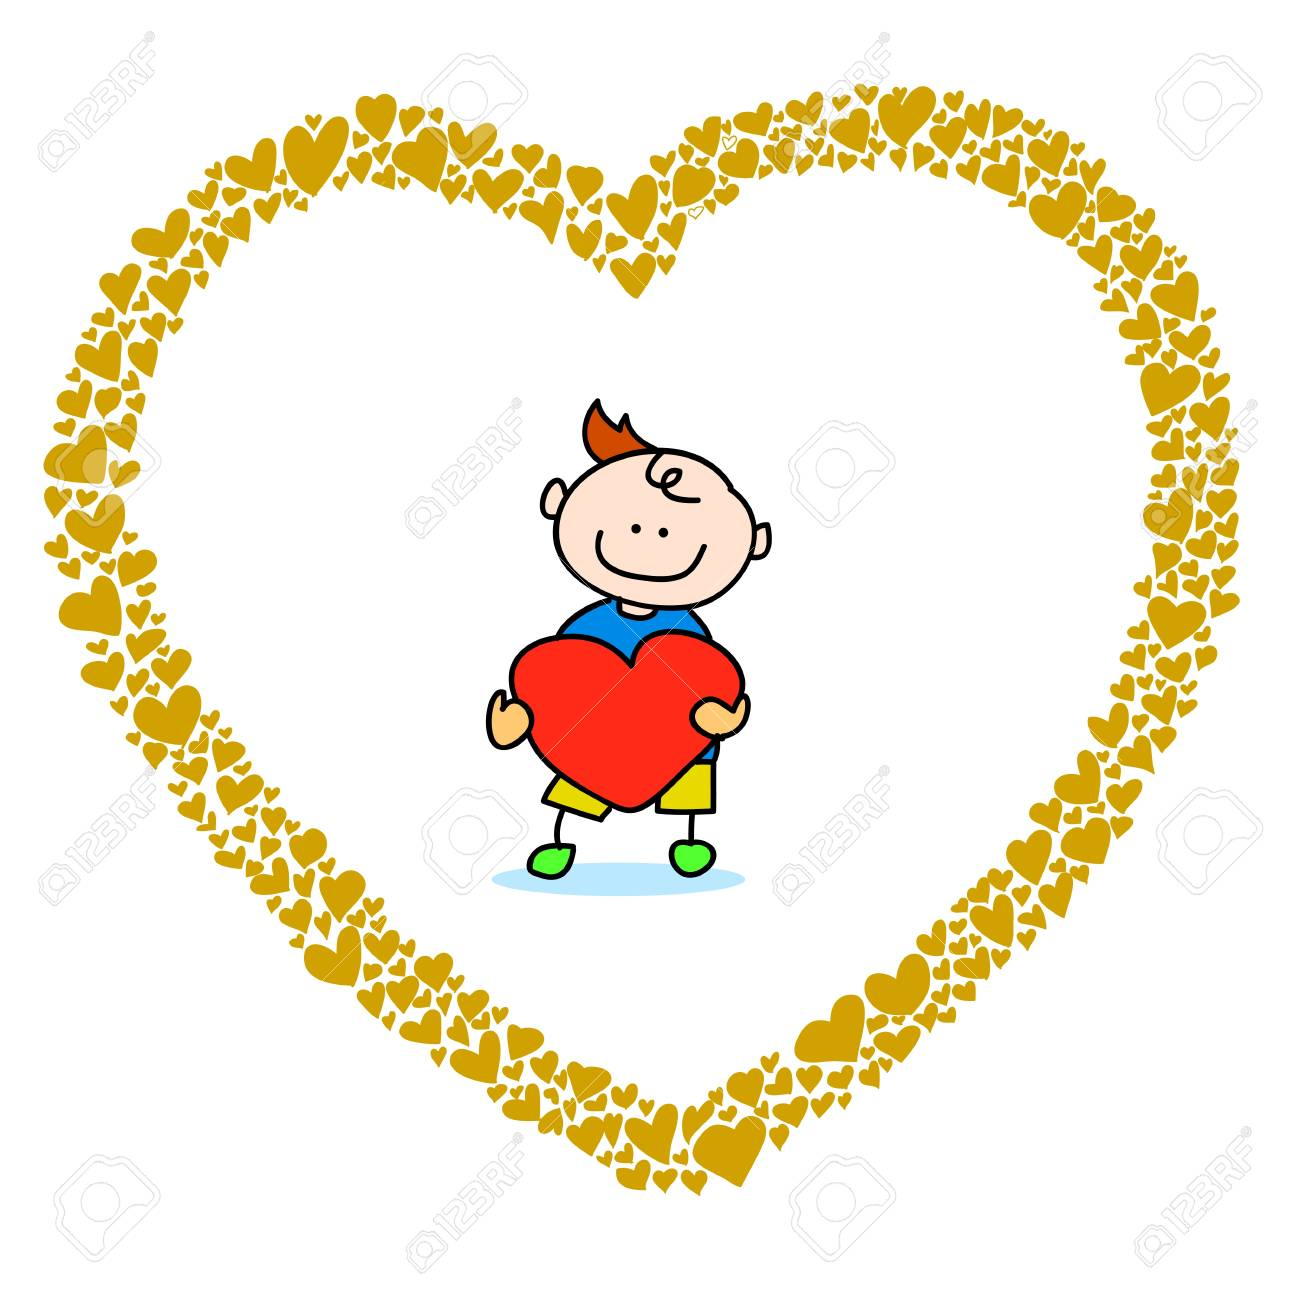 hand-drawn heart sketch design for valentine Stock Vector - 17451077